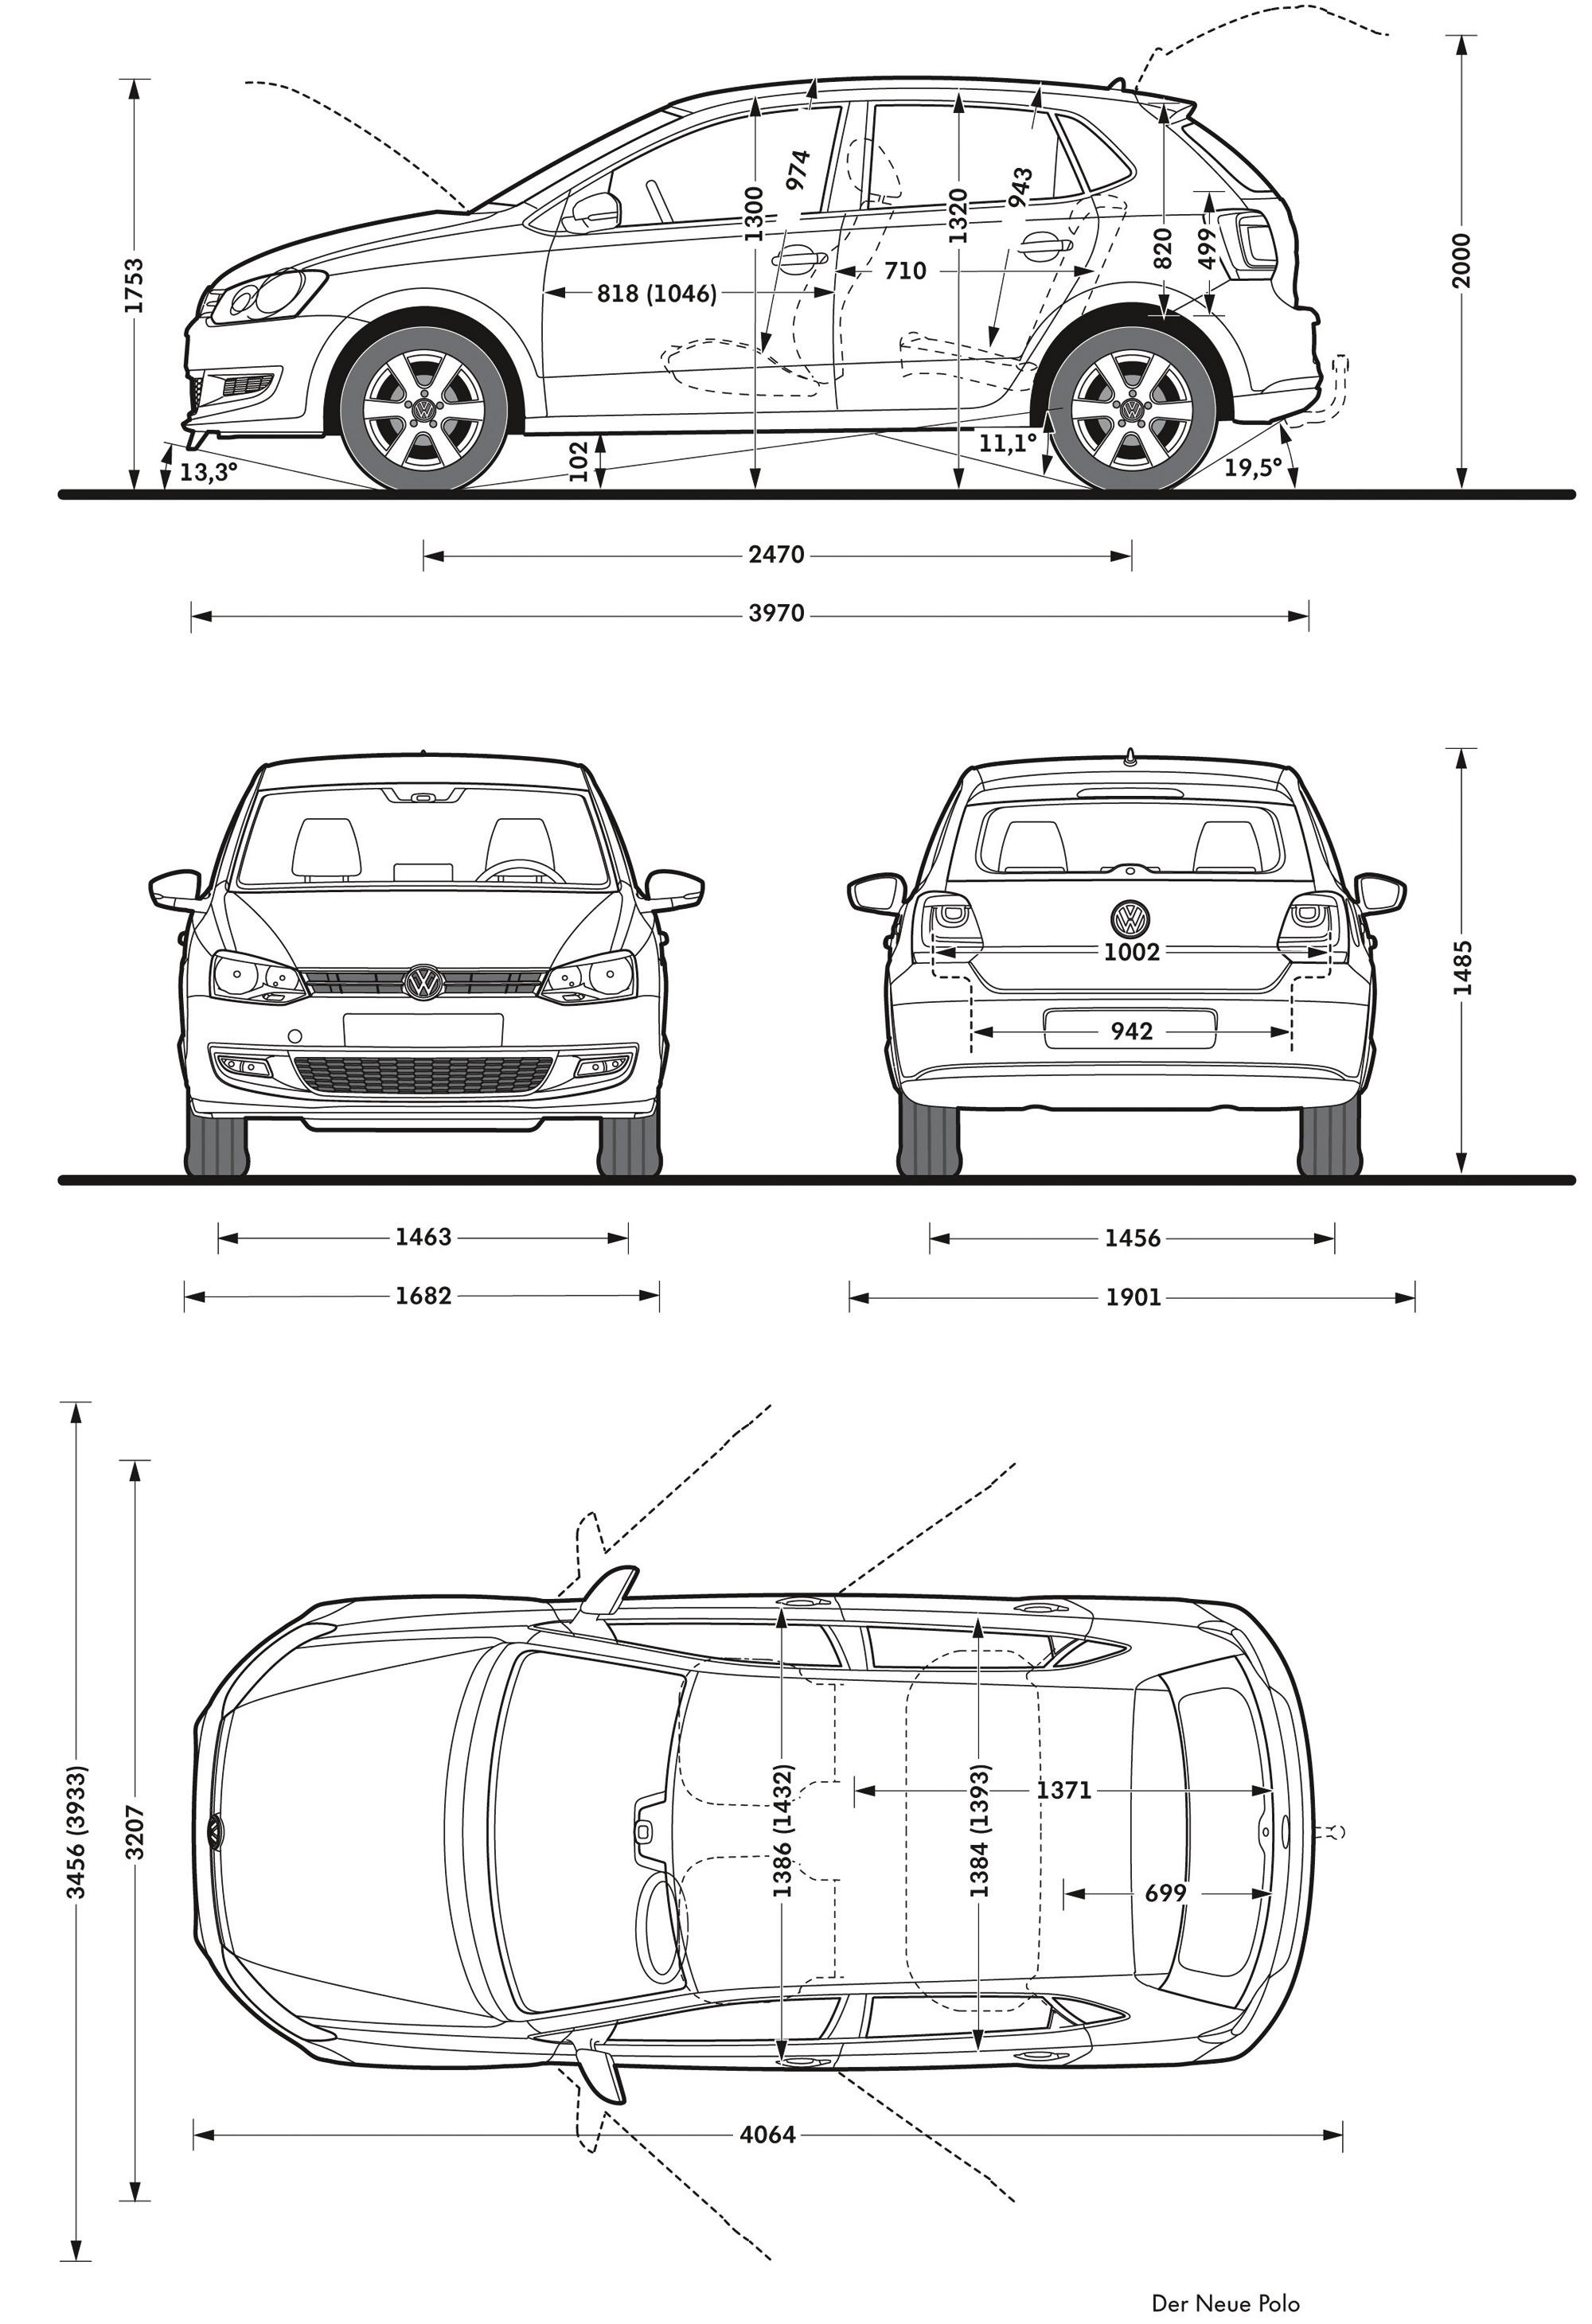 Ausmotive The New Volkswagen Polo